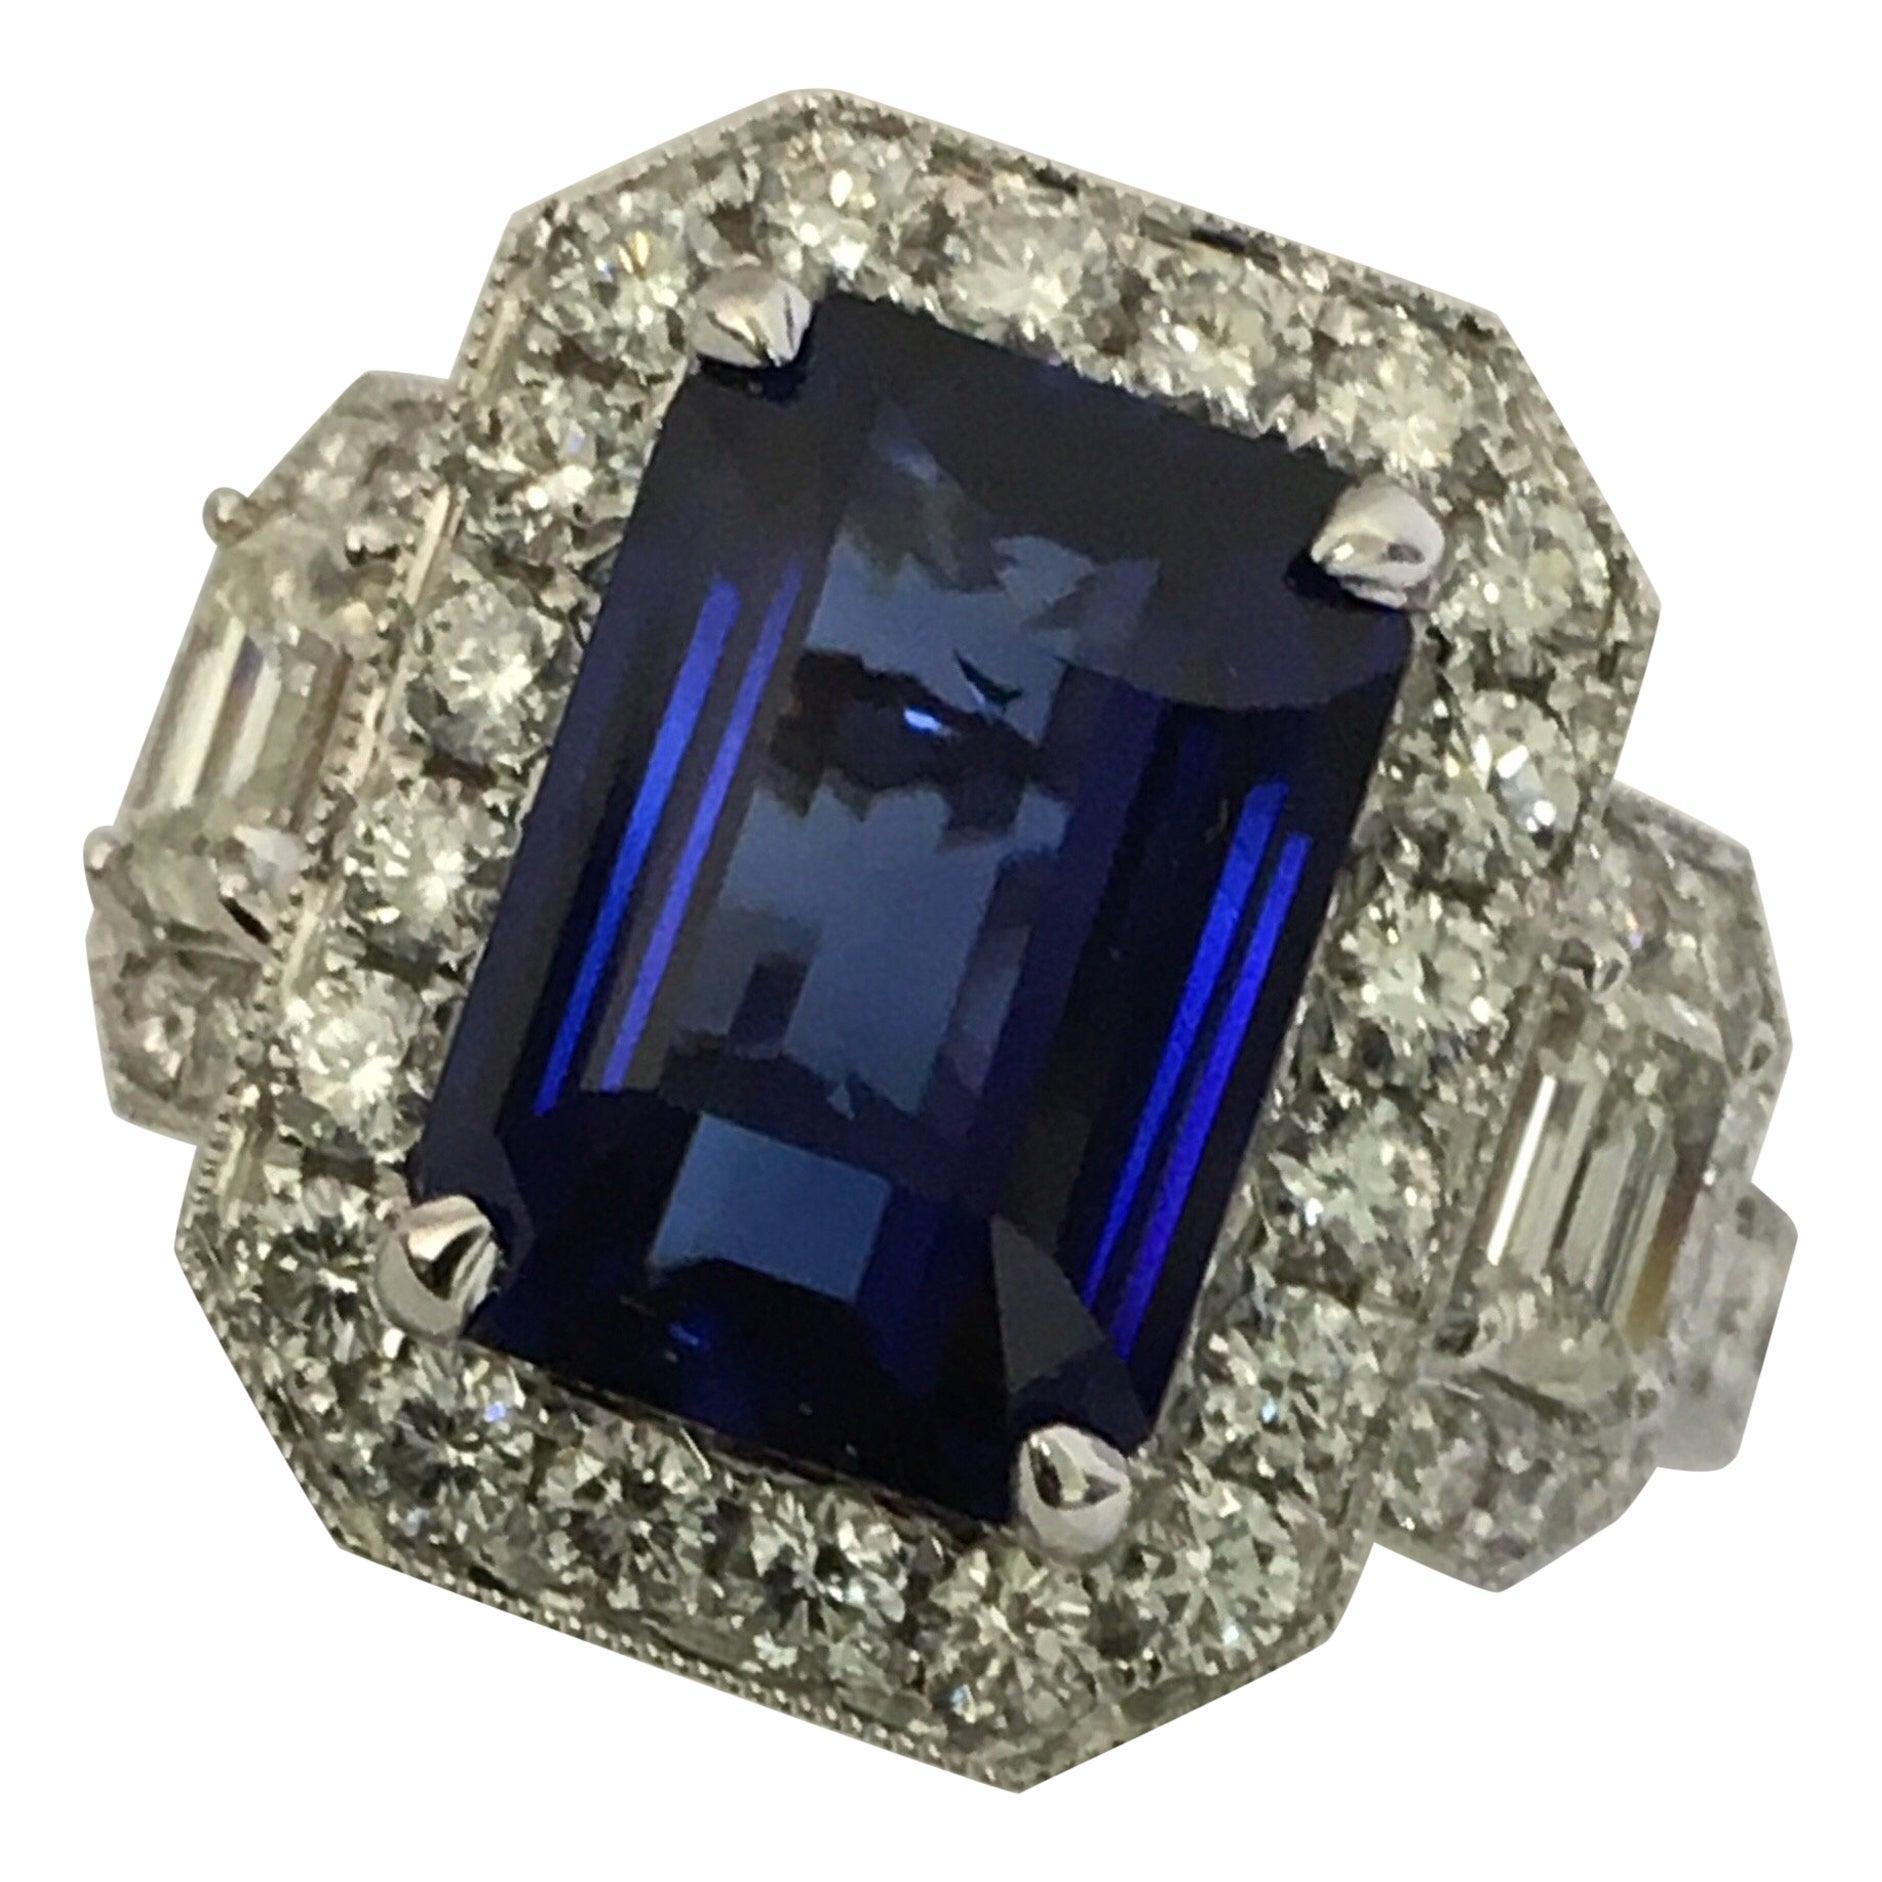 GIA Certified 5.60 Carat Sapphire Diamond Cocktail Ring